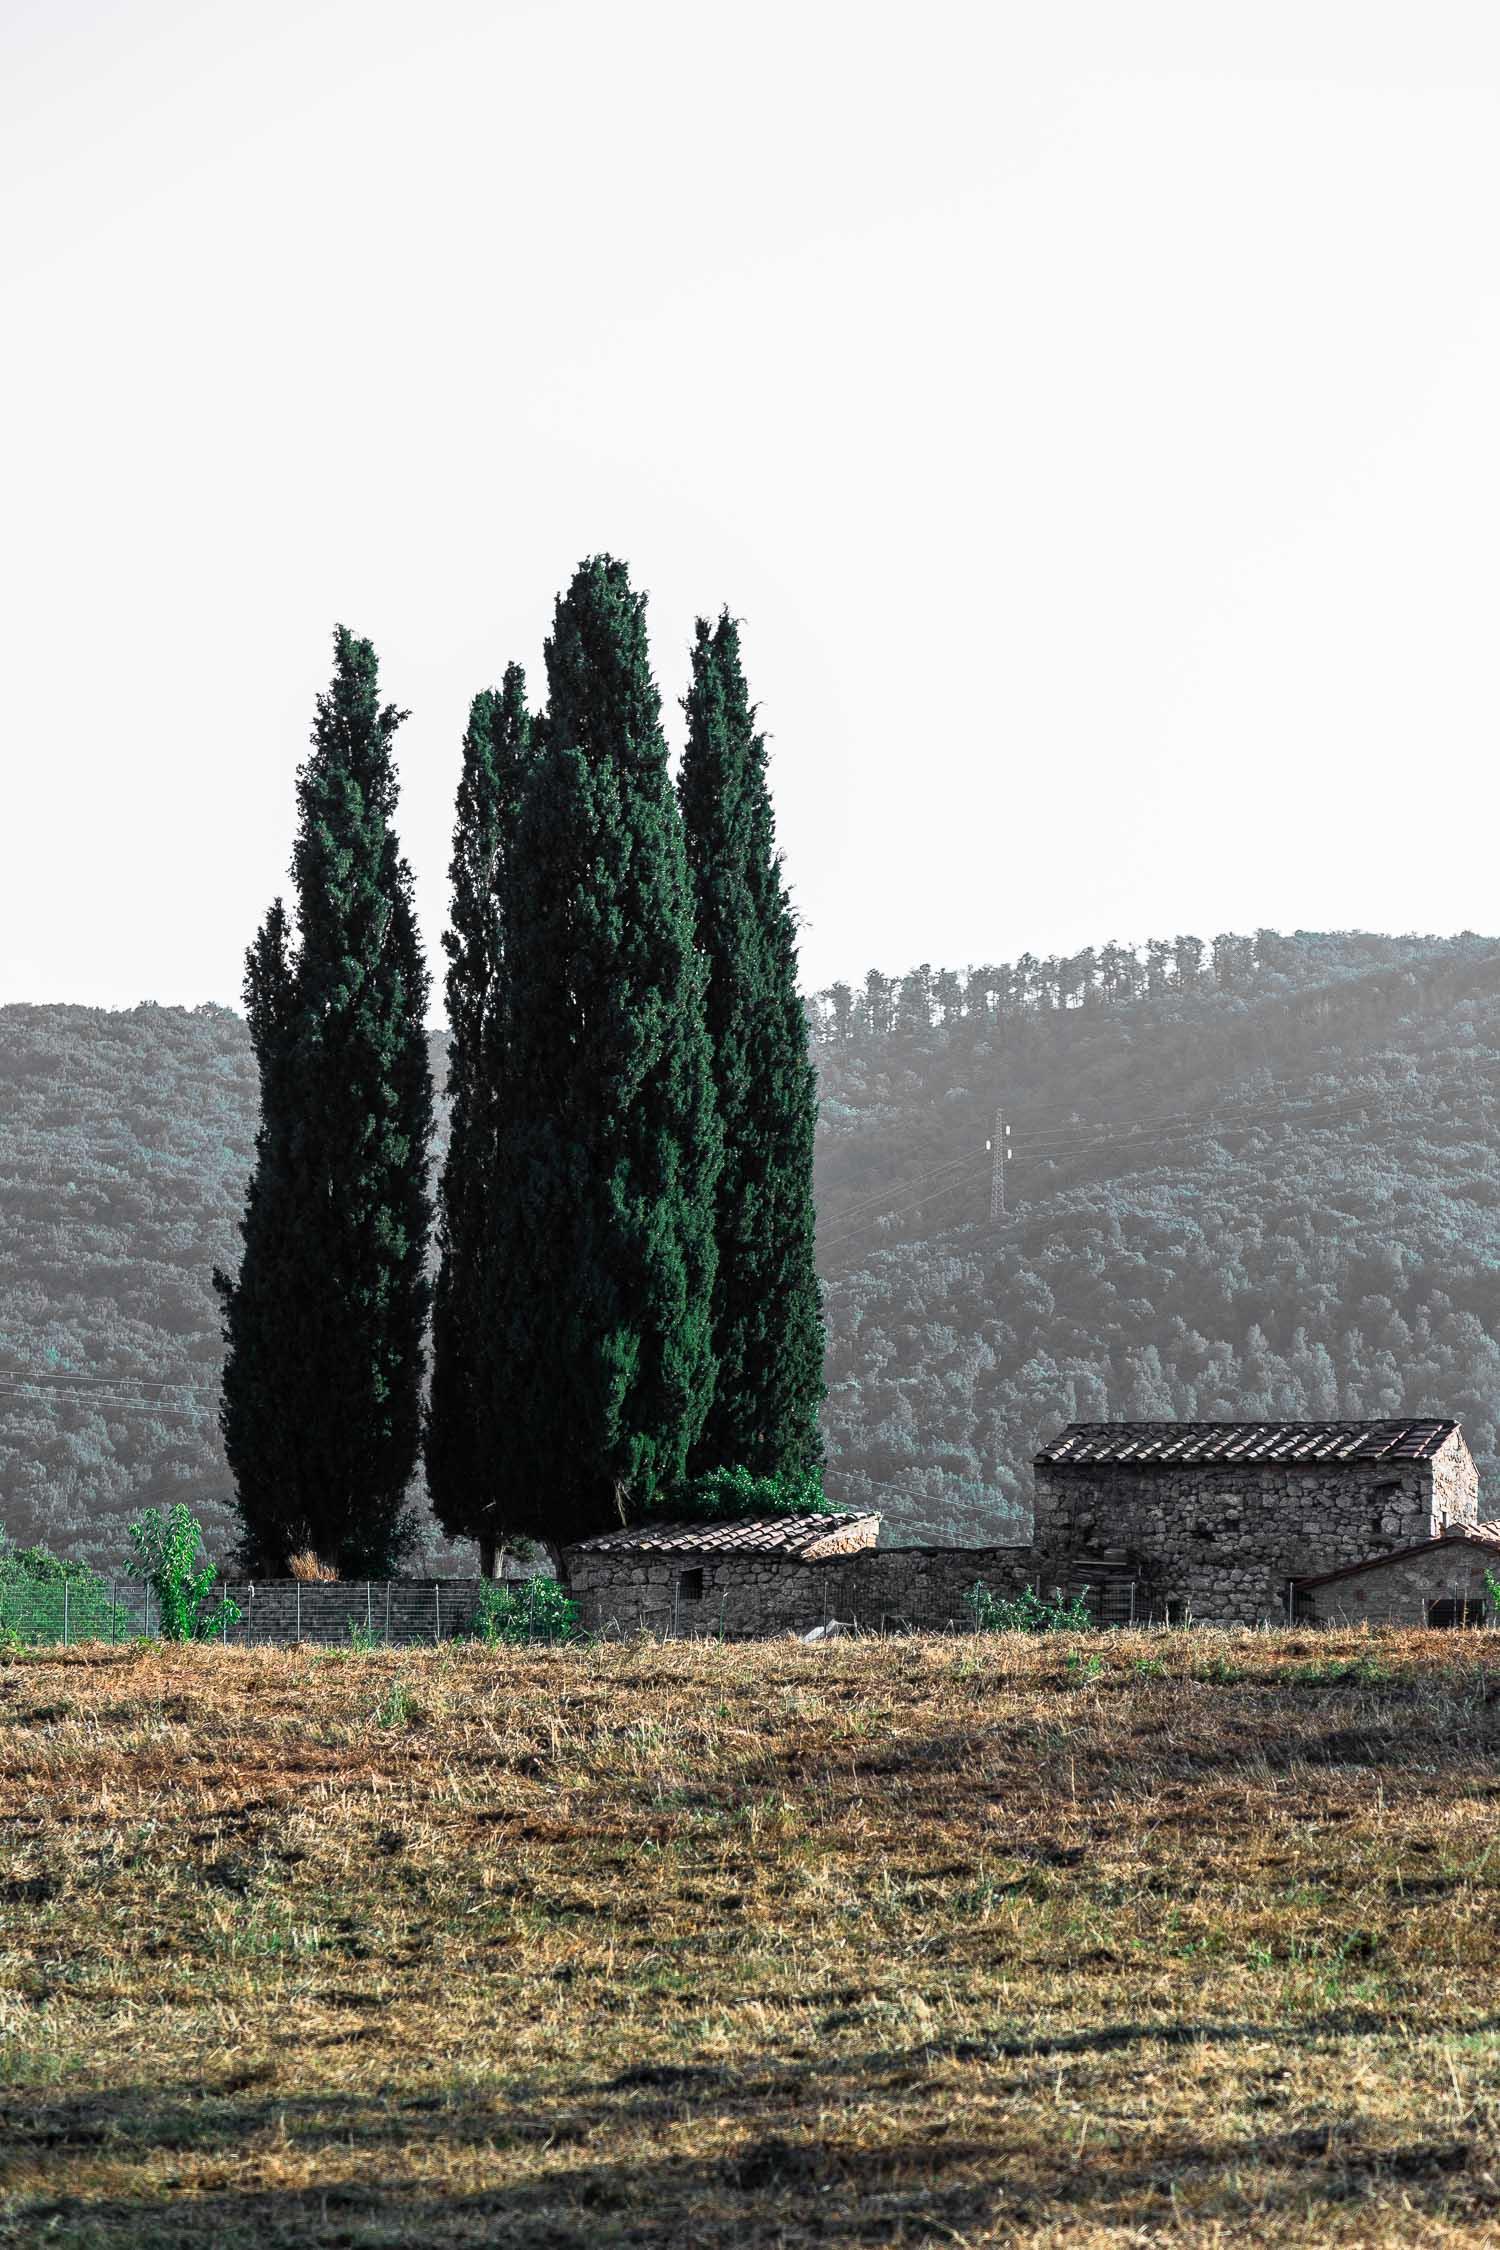 Tuscany-cypresses-landscape-4233.jpg